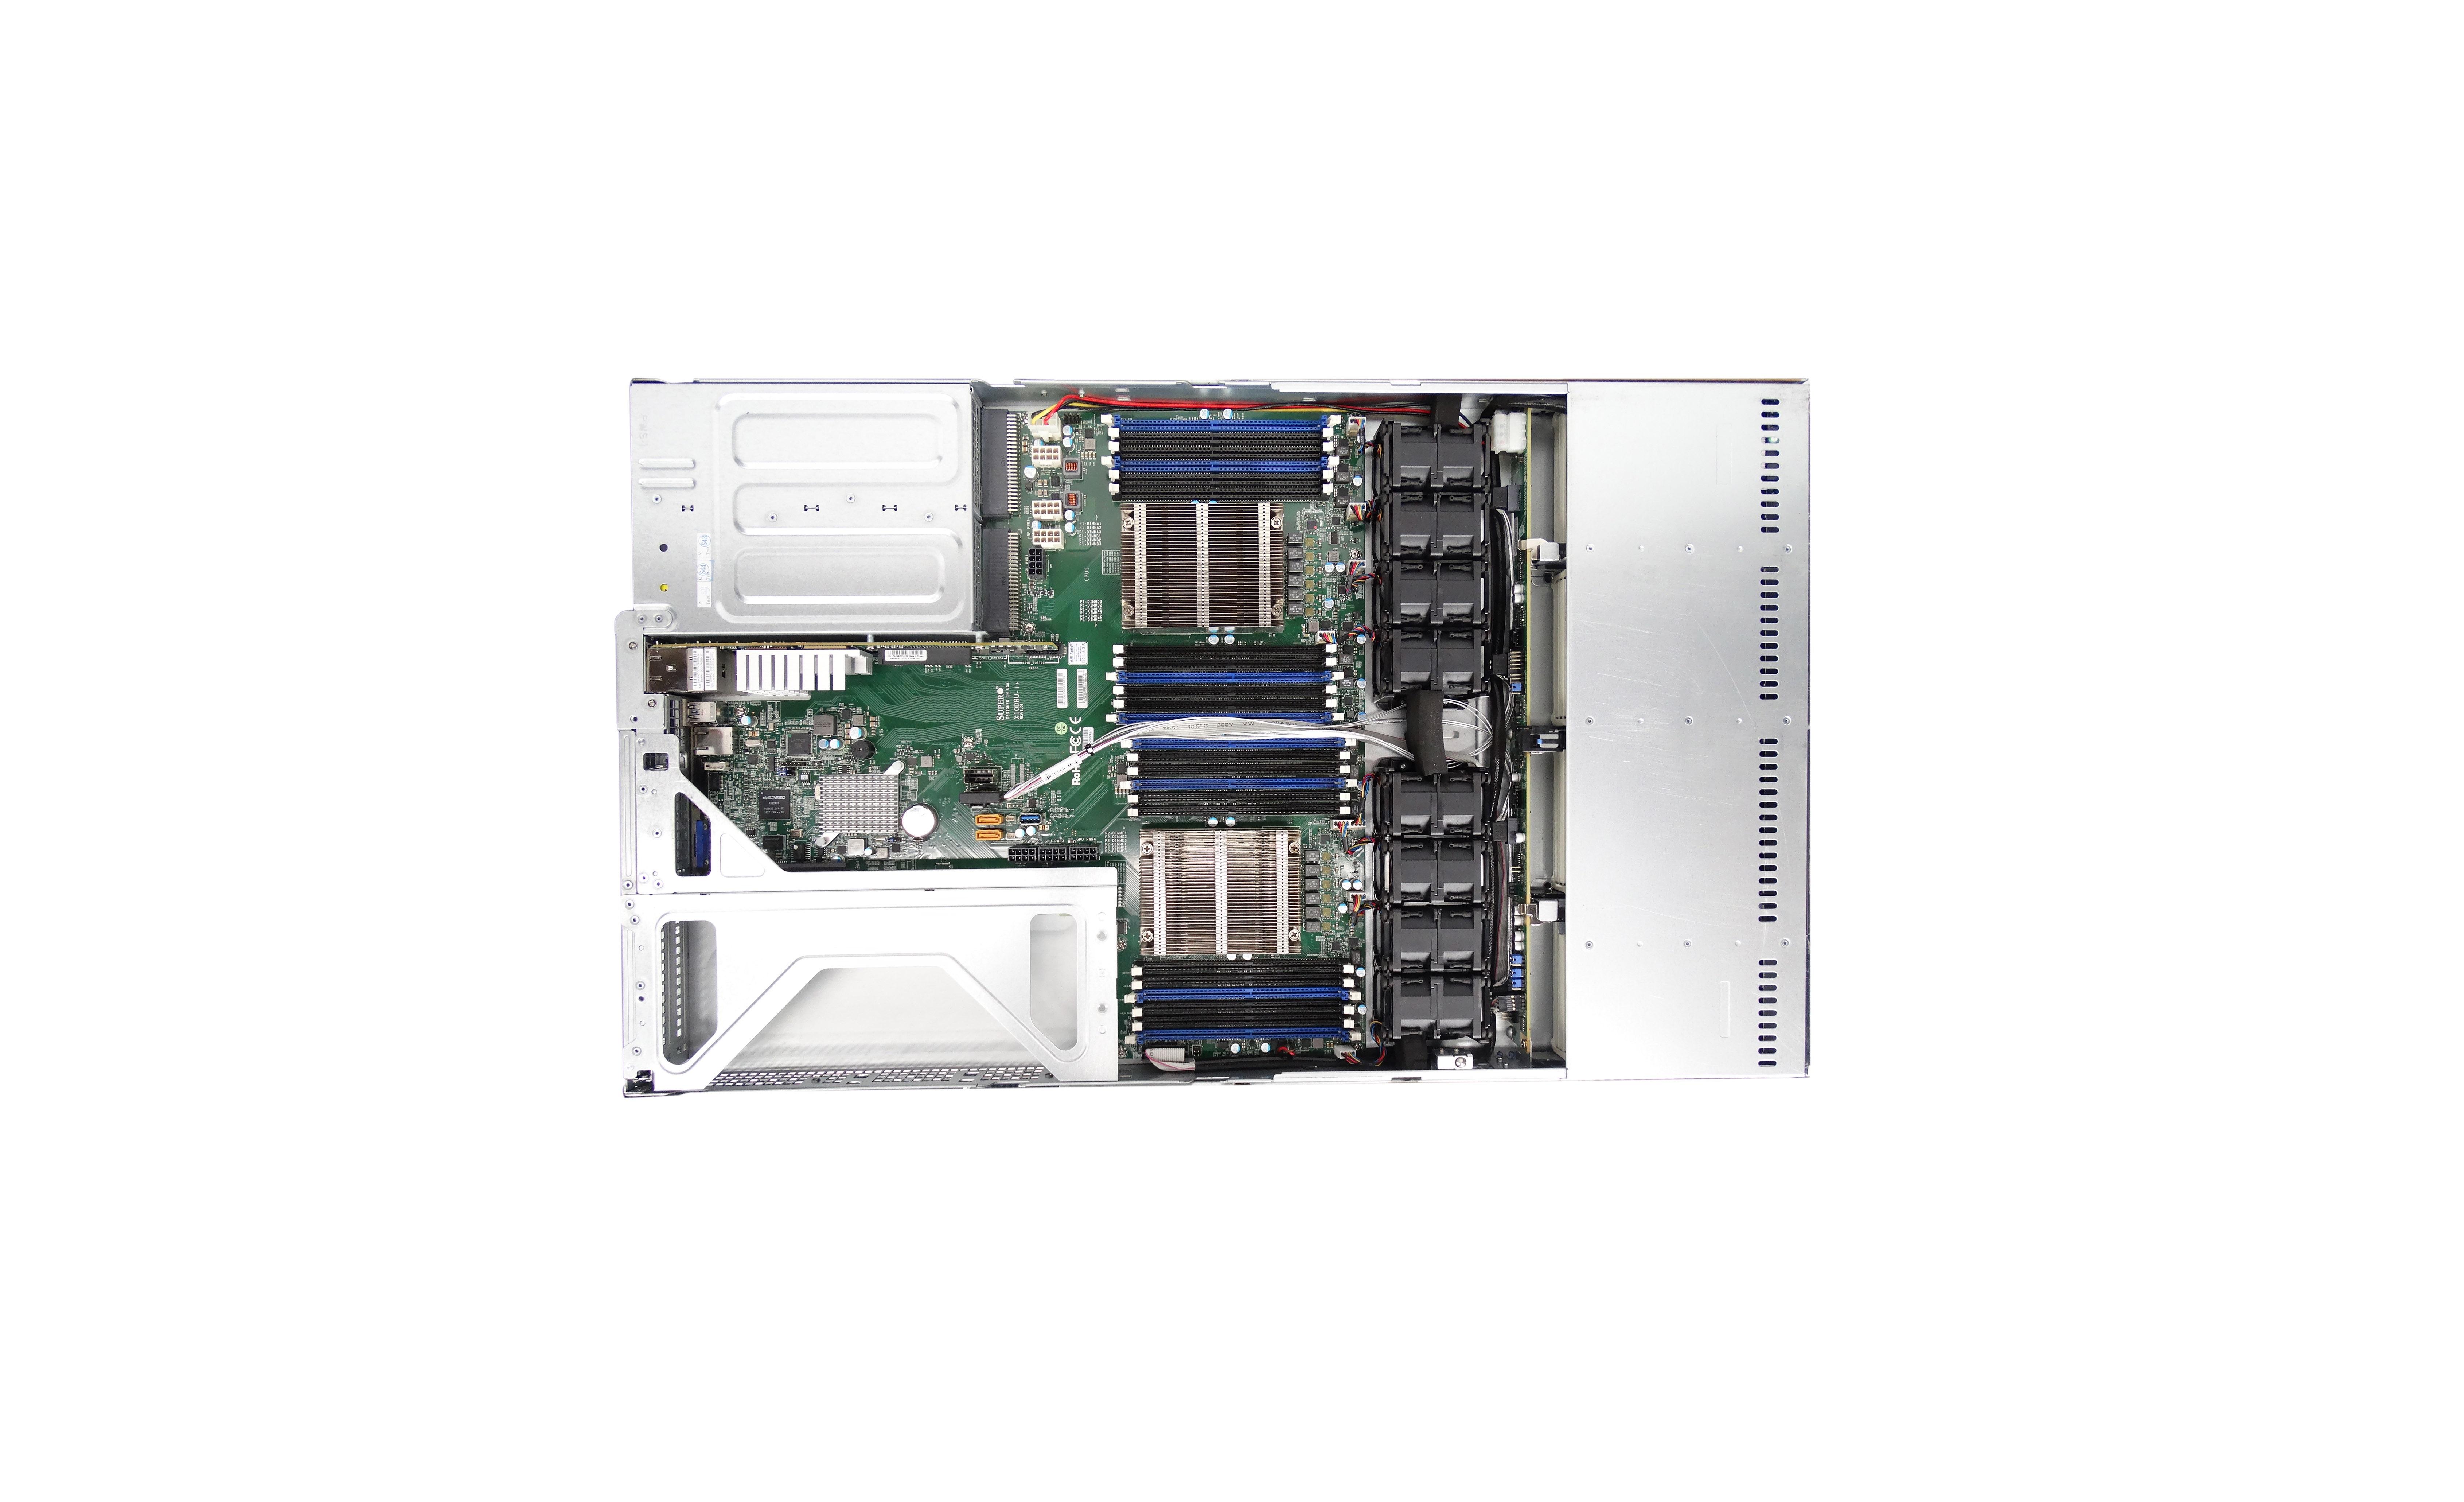 Supermicro-6018U-TR4T-4-Bay-1U-2x-Xeon-E5-2650-V3-2-3GHz-10C-16GB-2x-3TB-SATA thumbnail 3